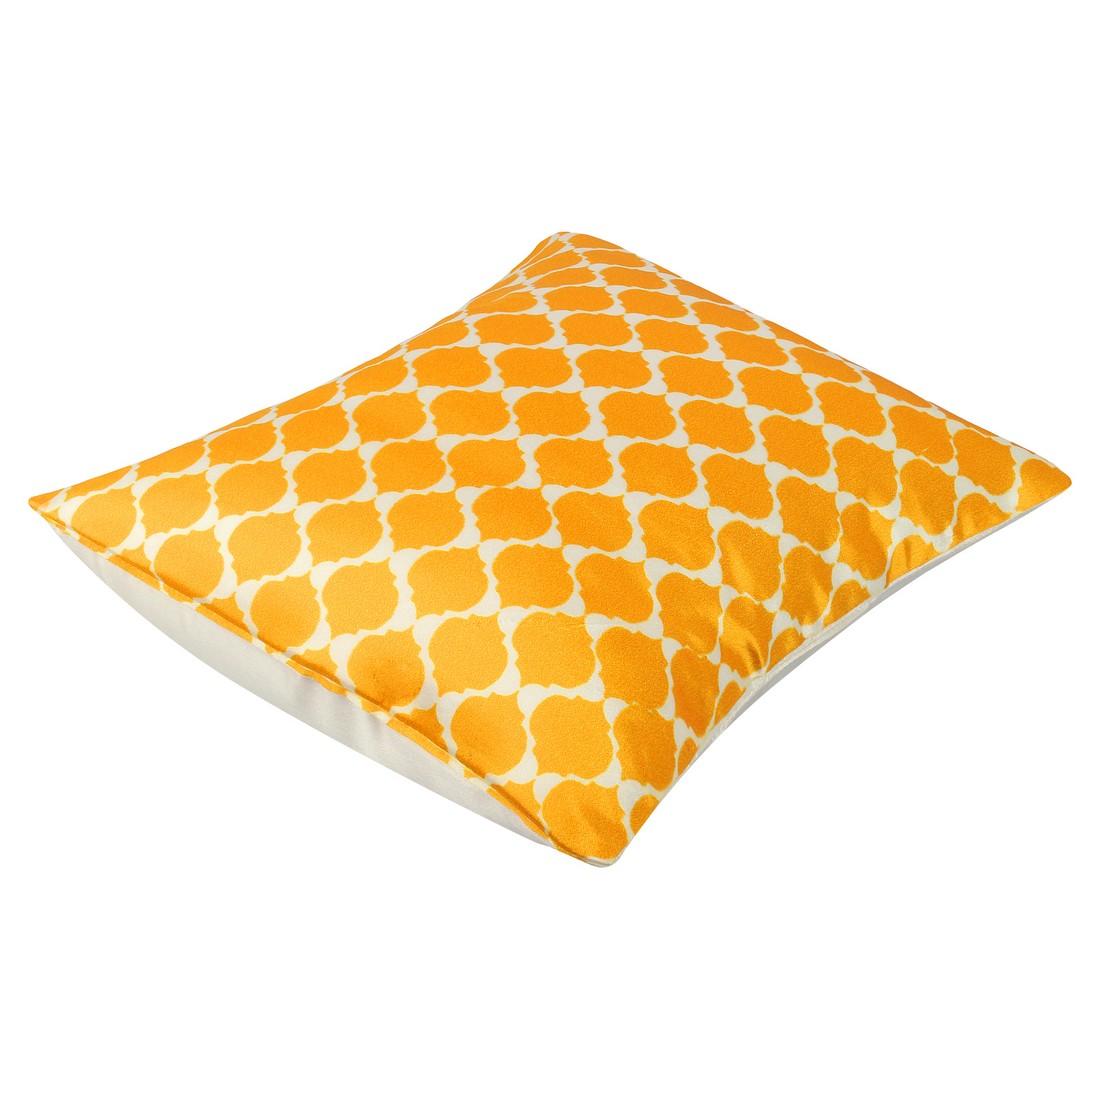 "Sattva Premium Digital Printed Cushion Cover CU016 With Filler Multicolor - Size 16""x16"""